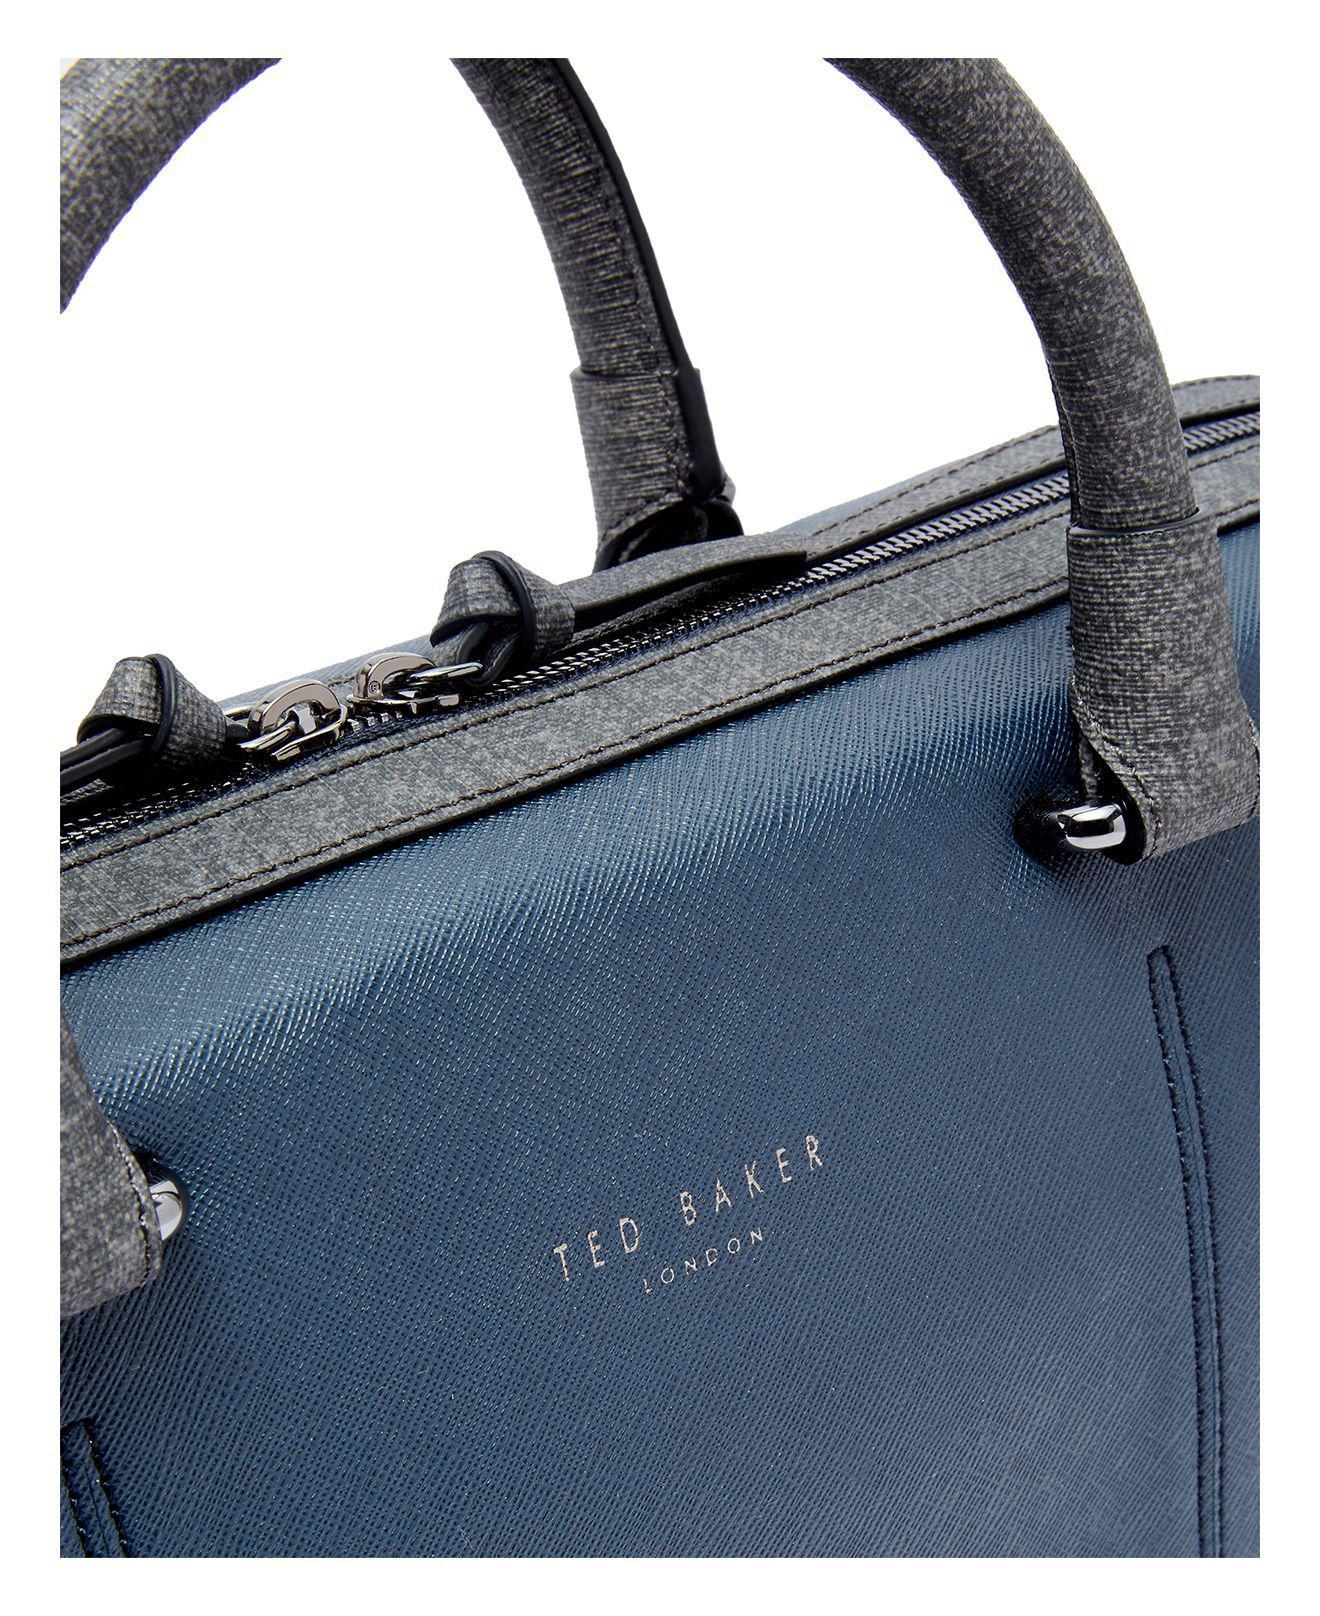 Lyst - Ted Baker Pounce Crossgrain Document Bag in Blue for Men 3c76de26eefce